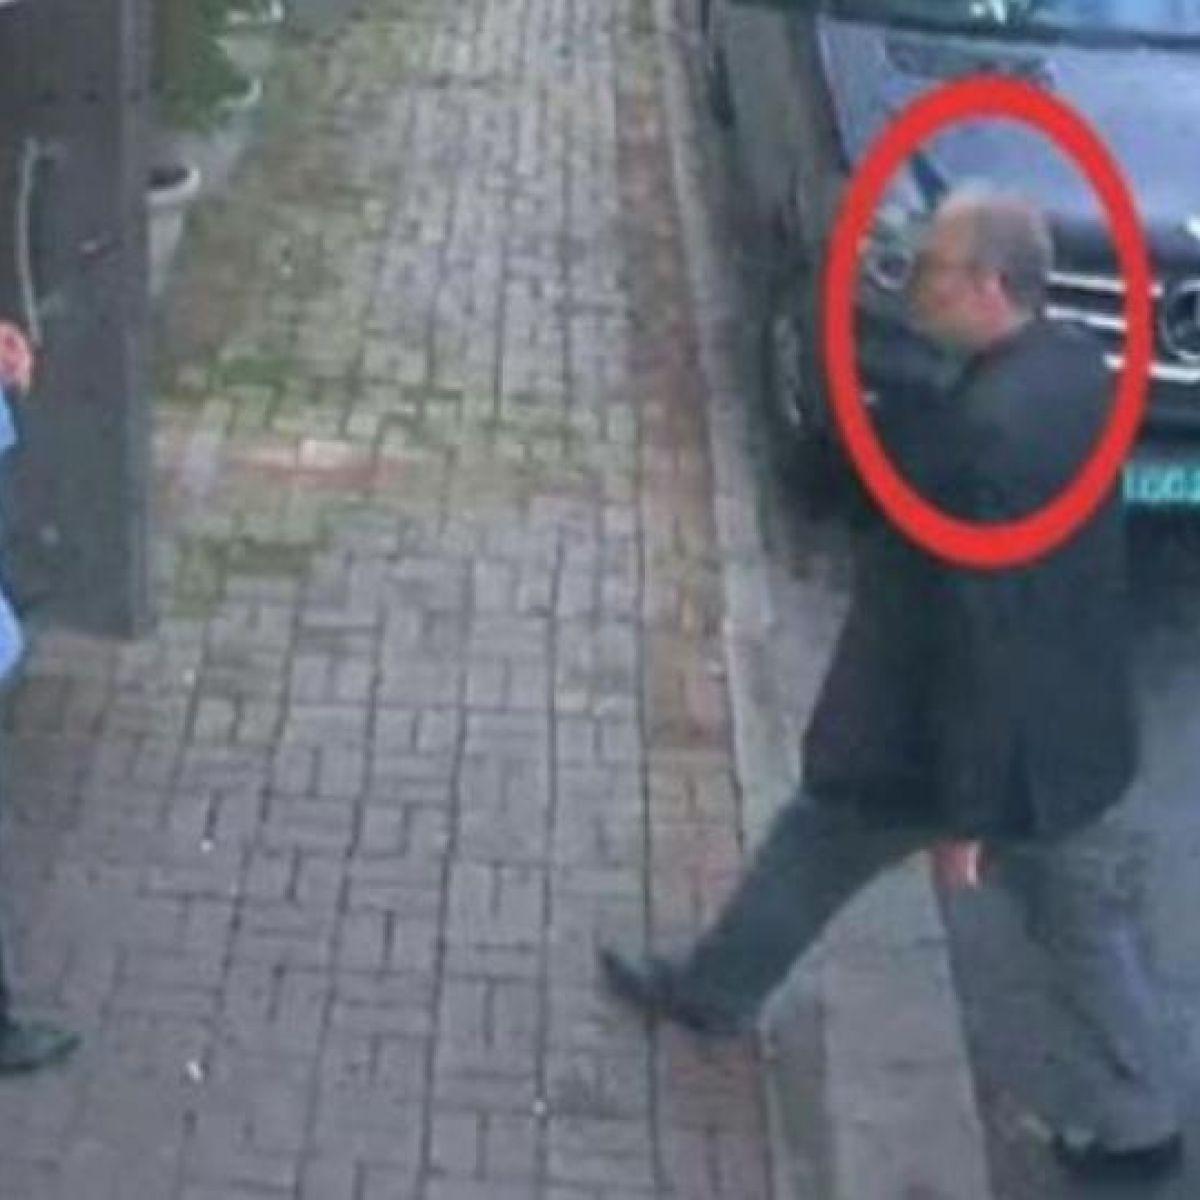 Jamal Khashoggi killing was premeditated, says Saudi prosecutor